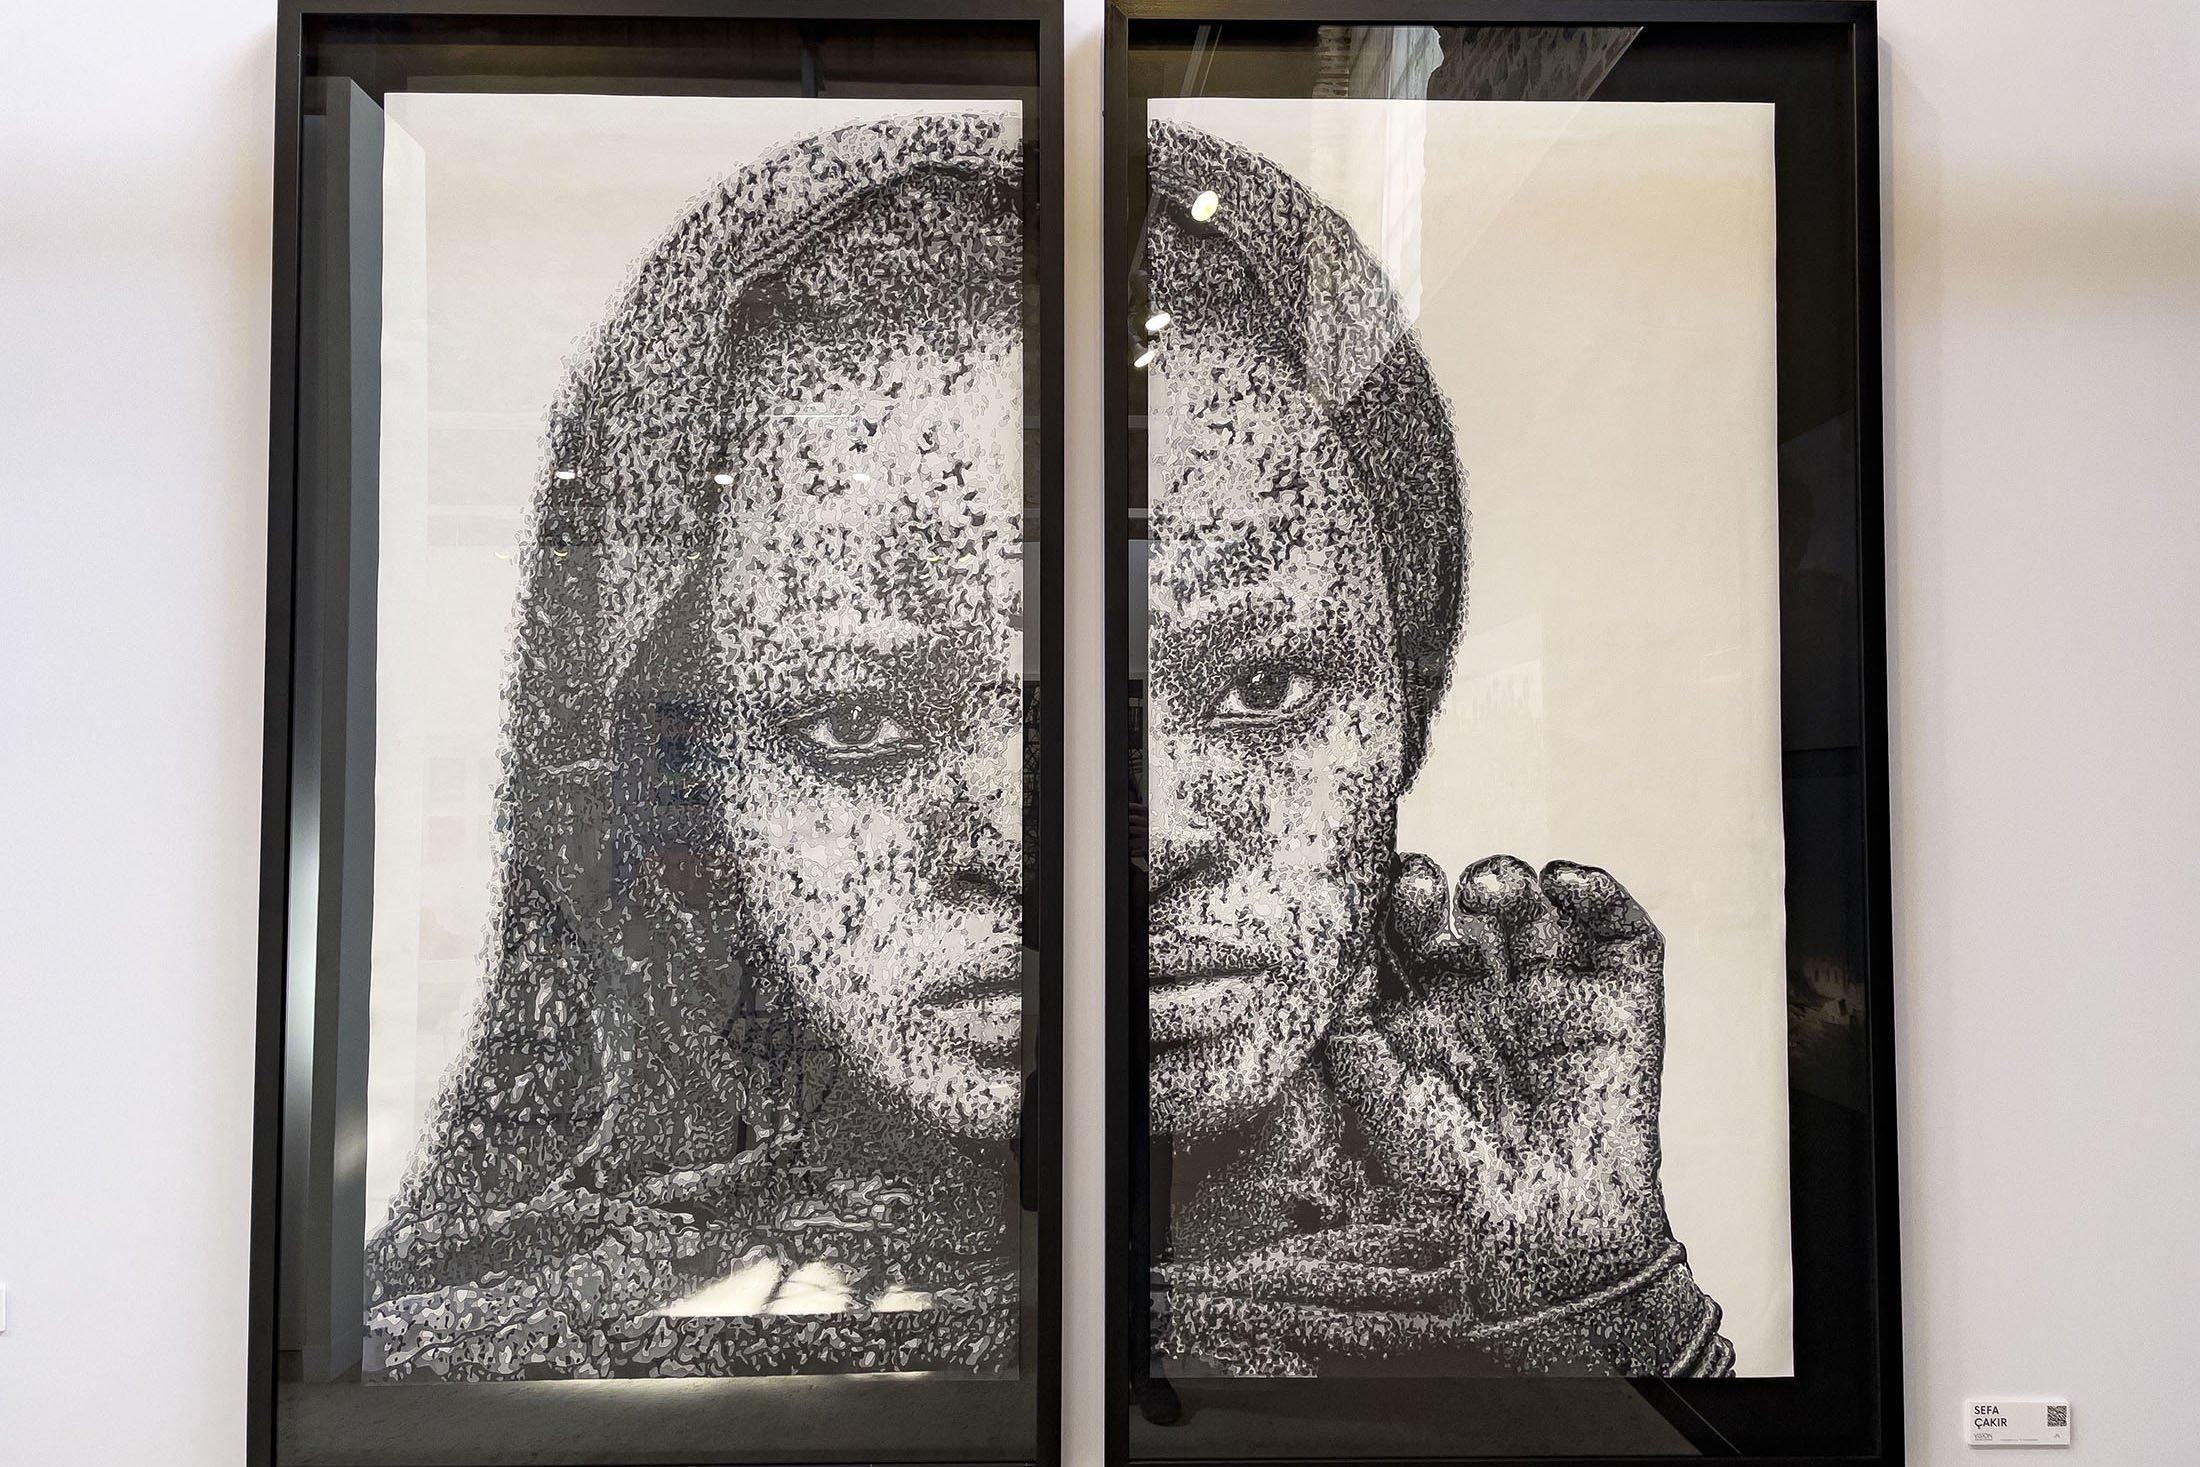 A split portrait by SefaÇakır in Contemporary Istanbul